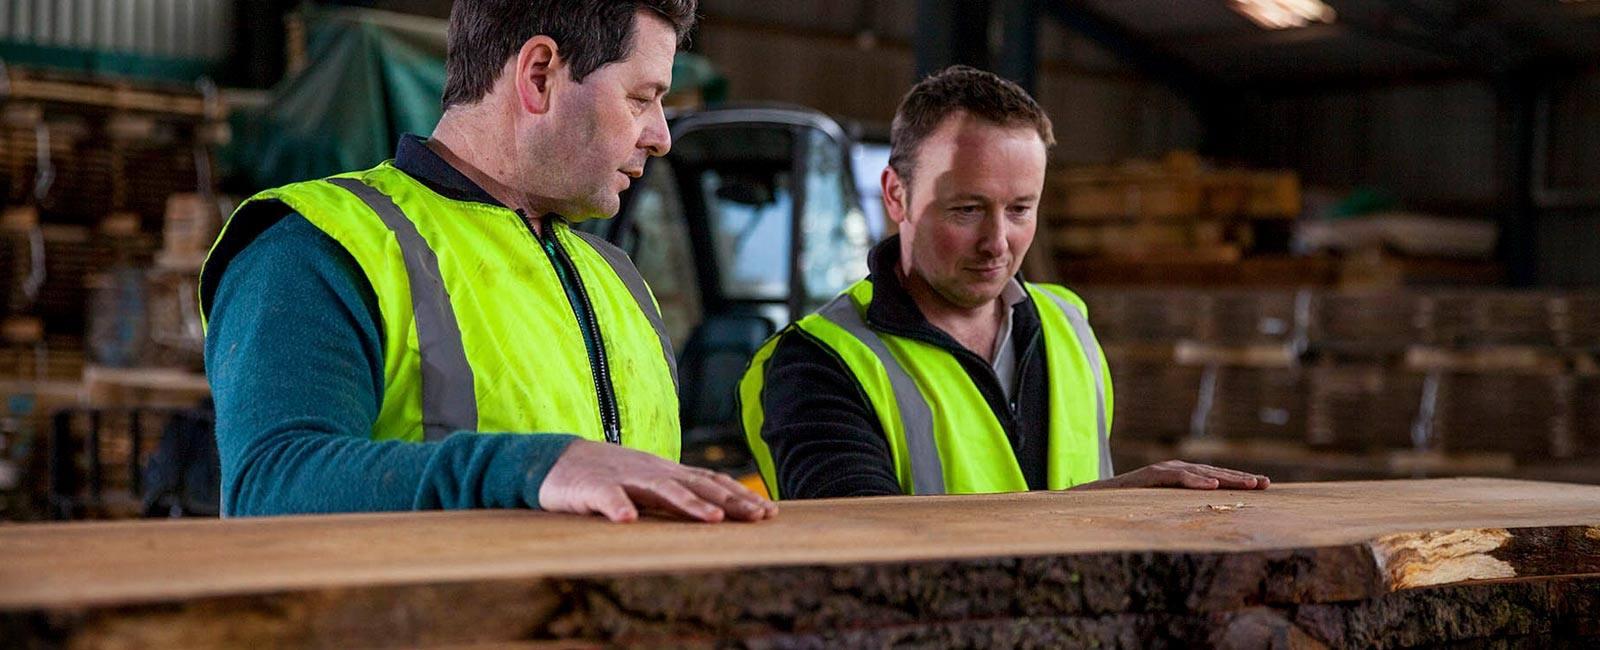 slider-sawmill-inspecting-quality.jpg.webp